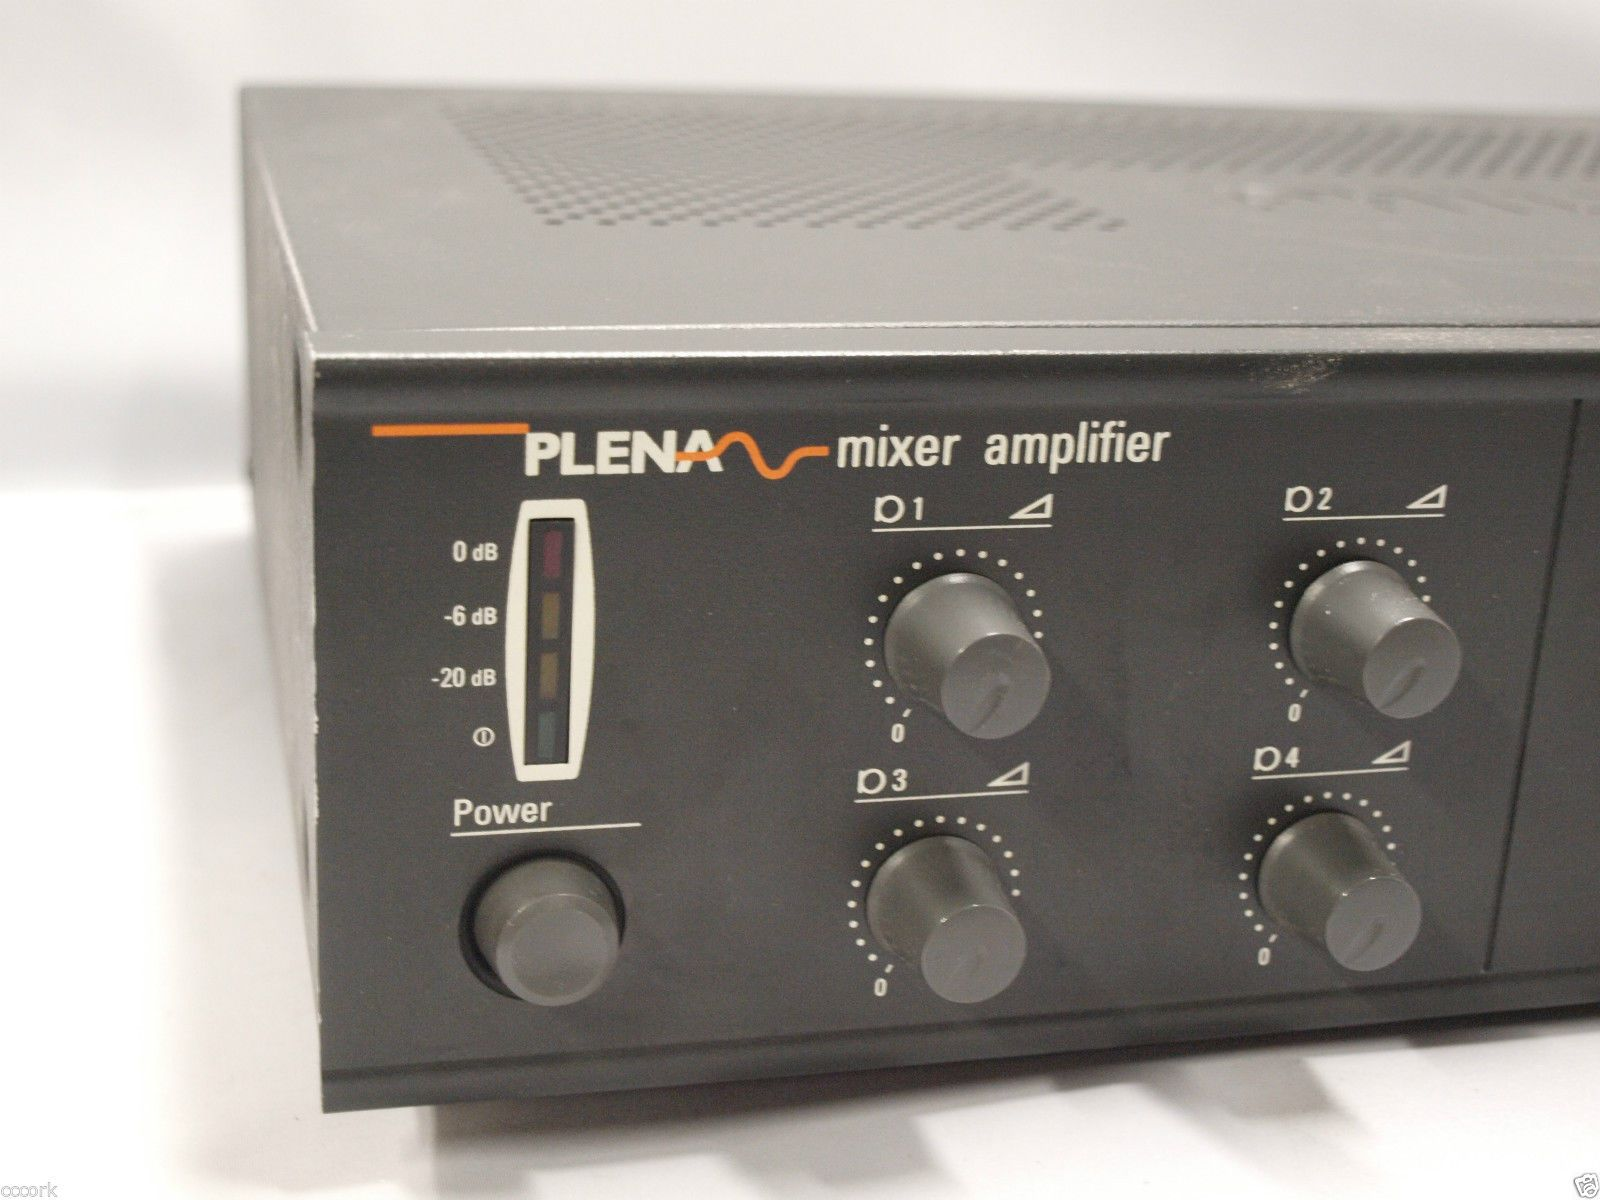 philips lbb 1906 10 plena mixer amplifier ebay. Black Bedroom Furniture Sets. Home Design Ideas